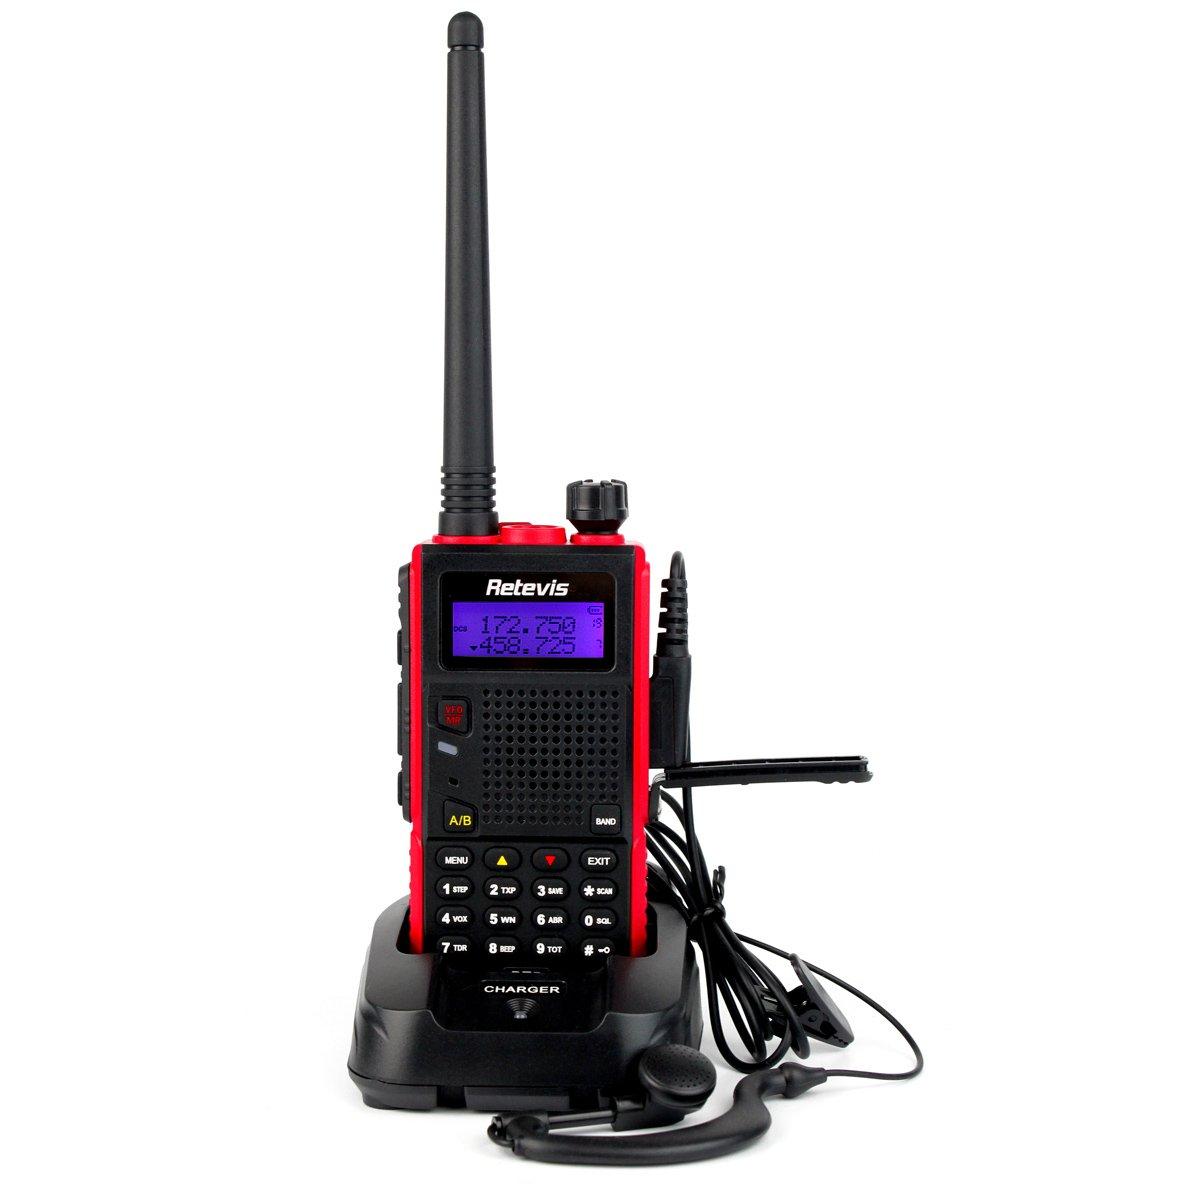 Retevis RT5 2 Way Radio 7W Dual Band VHF/UHF 136-174/400-520 MHz 128 Channel Scan VOX DTMF FM Radio 1750Hz Walkie Talkies (1 Pack)